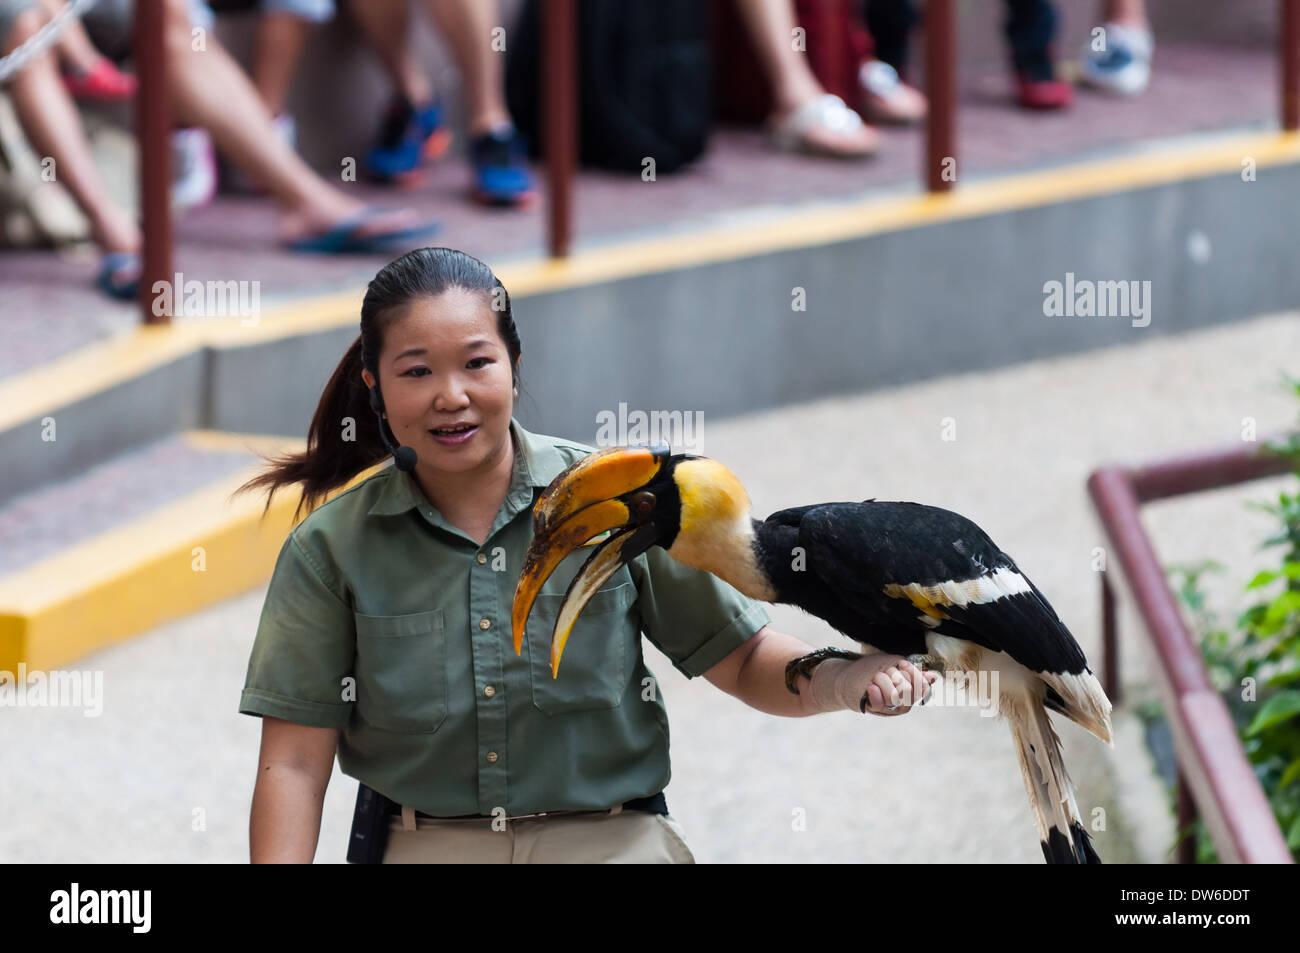 Muestra de aves en el Zoo de Singapur. Imagen De Stock